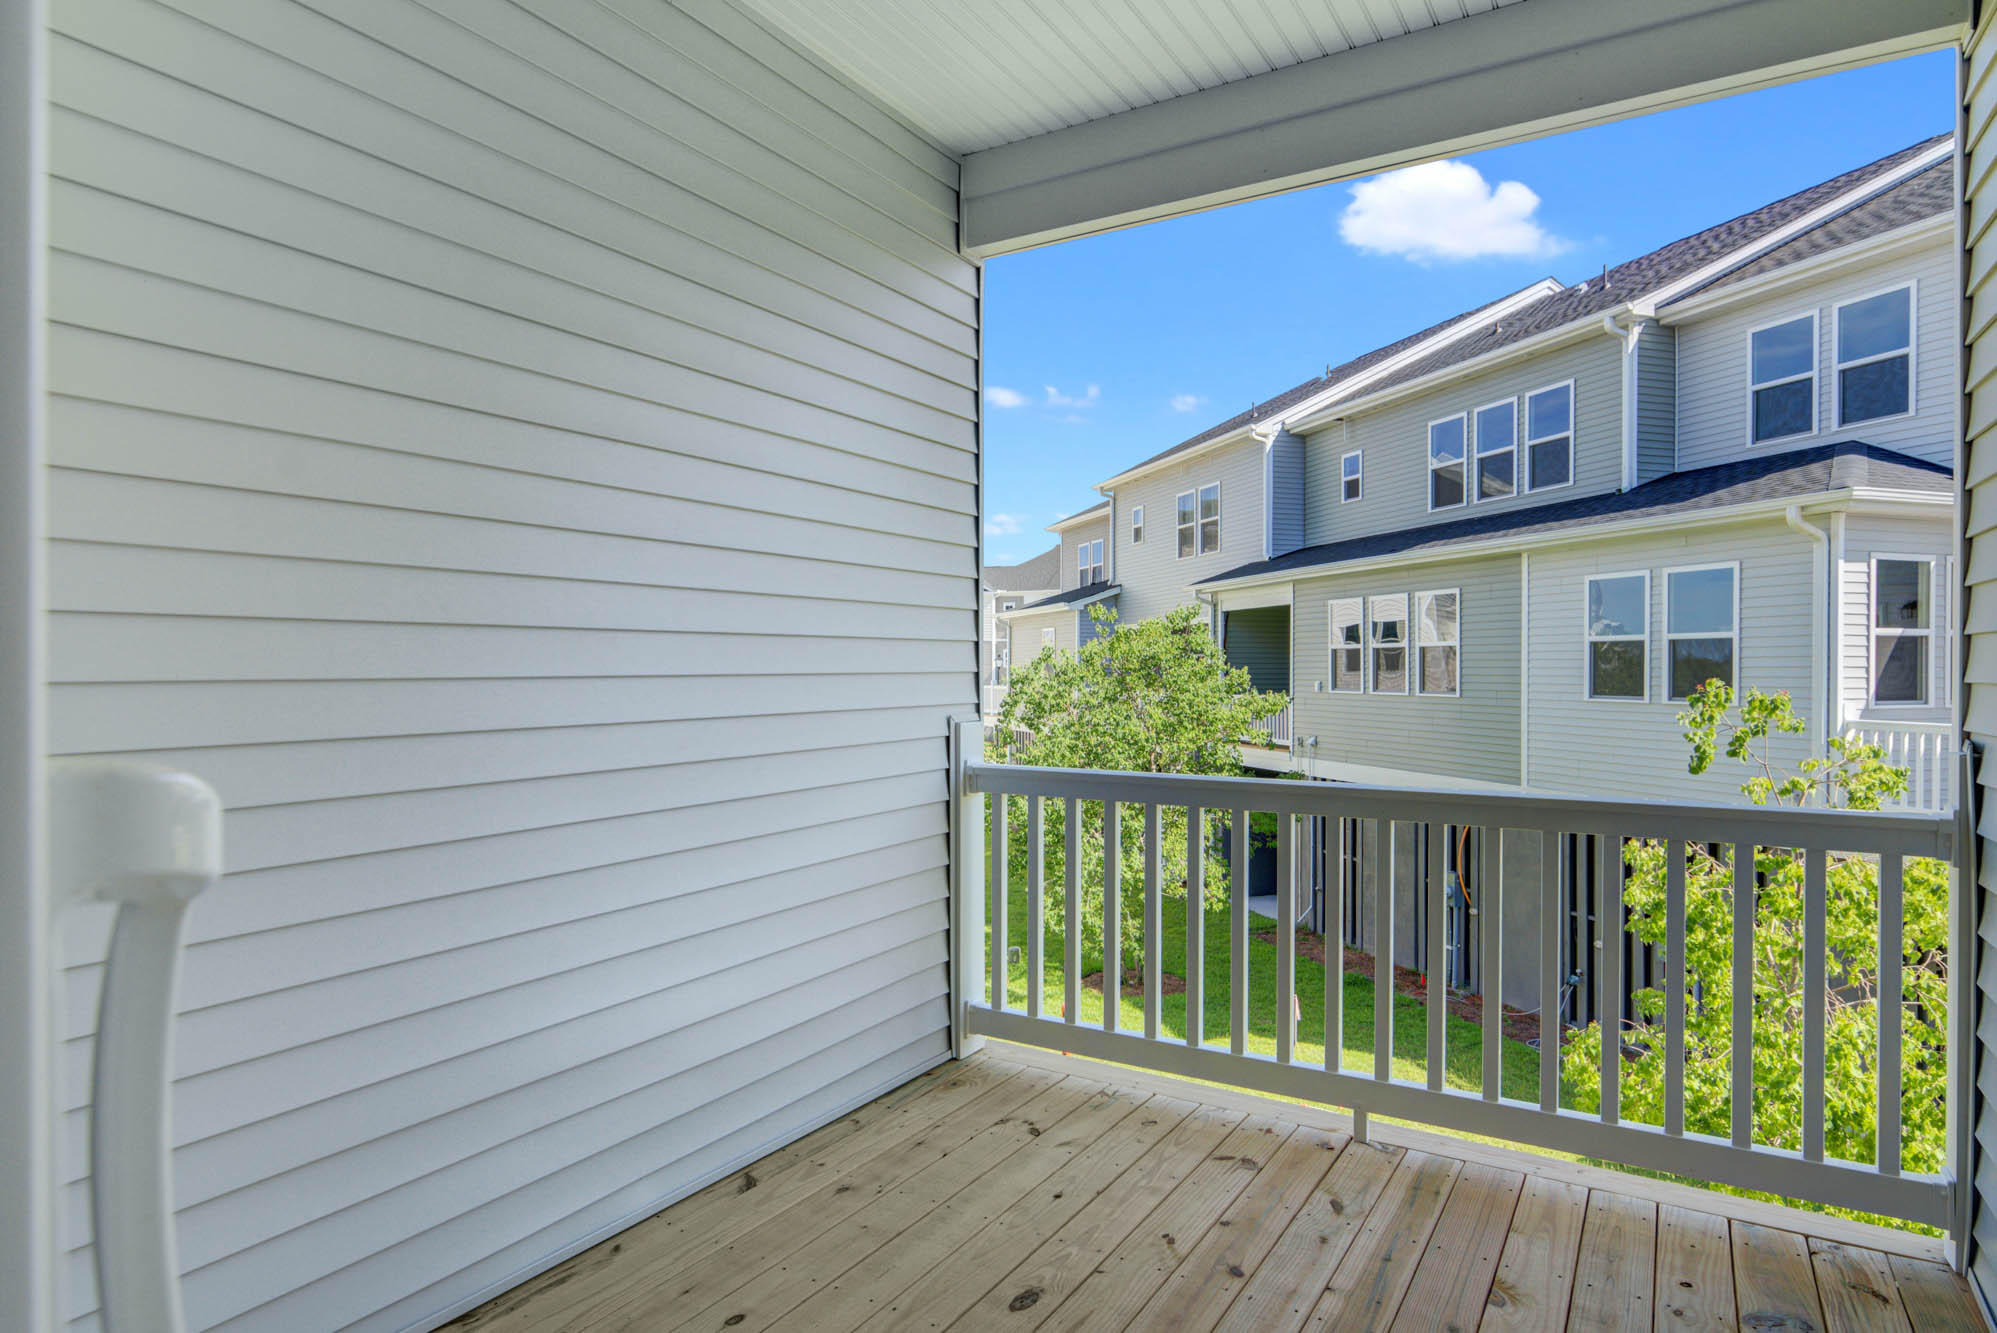 Marshview Commons Homes For Sale - 530 Mclernon, Johns Island, SC - 2